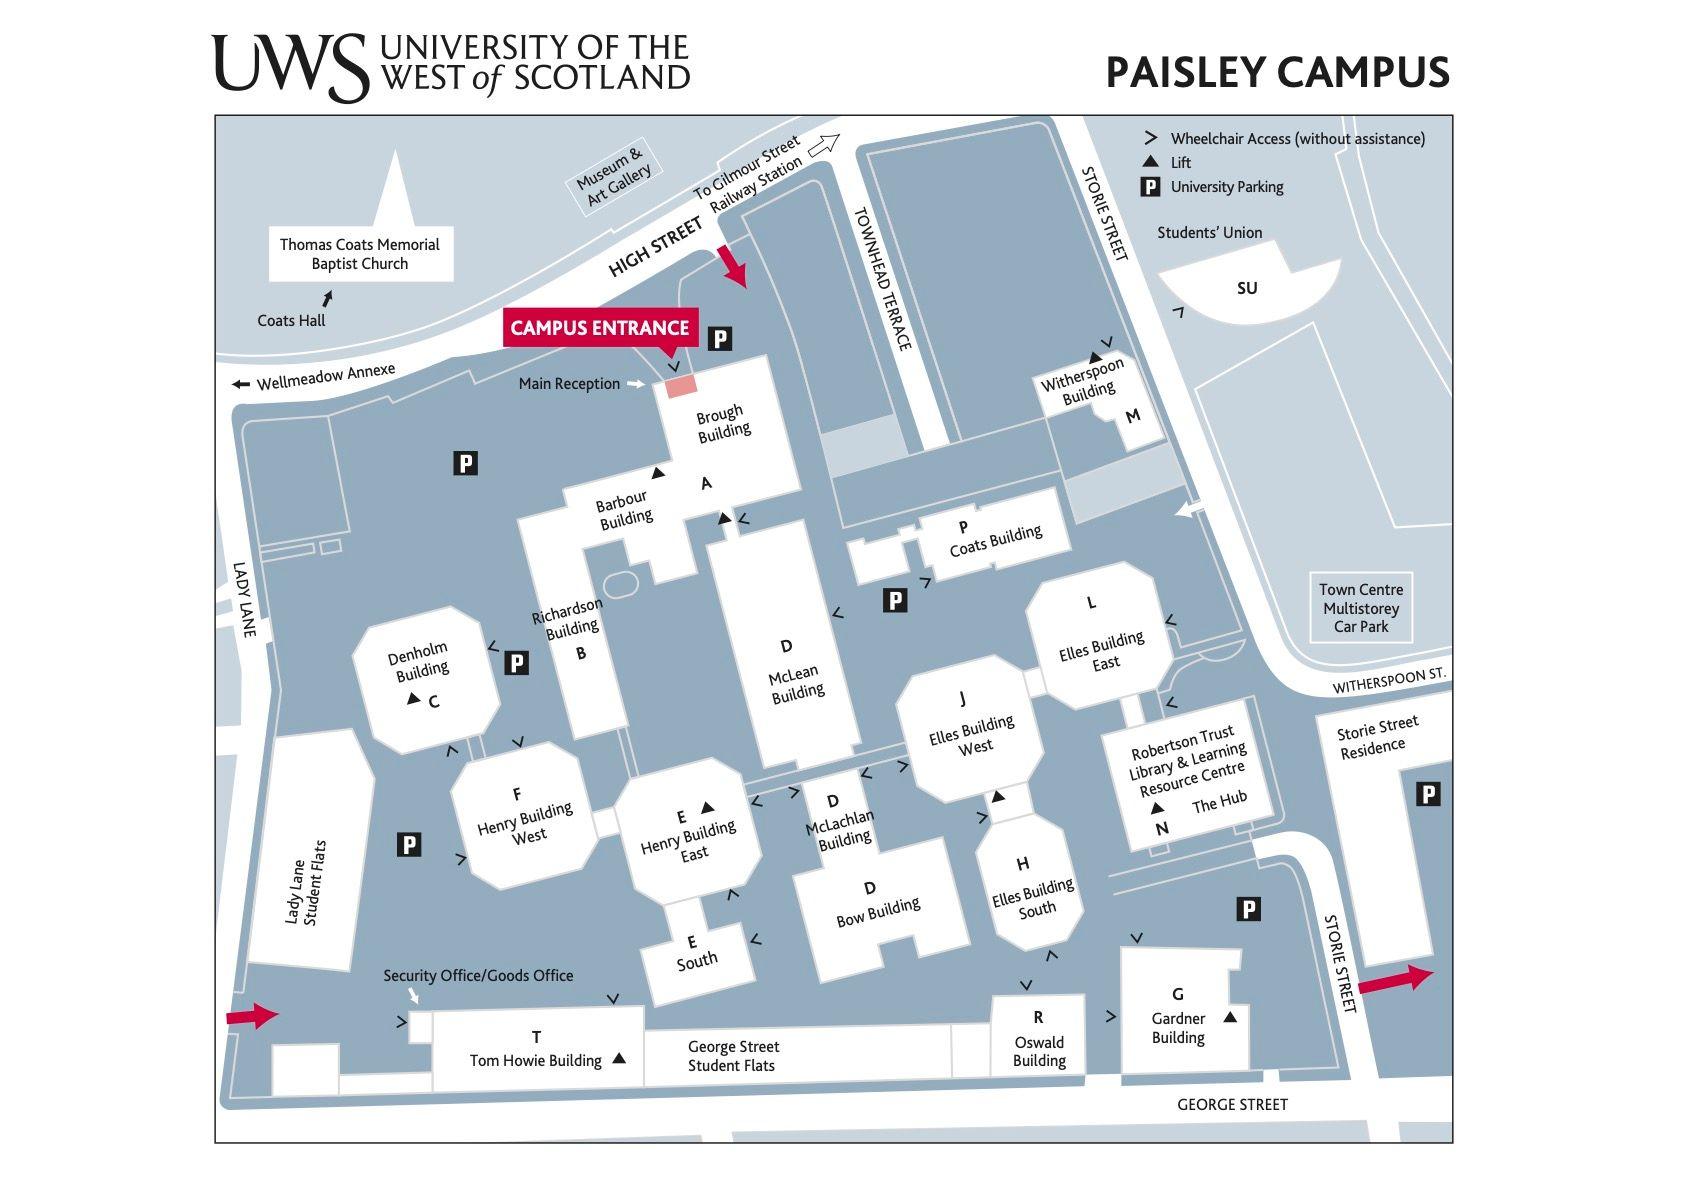 university of the west of scotland paisley